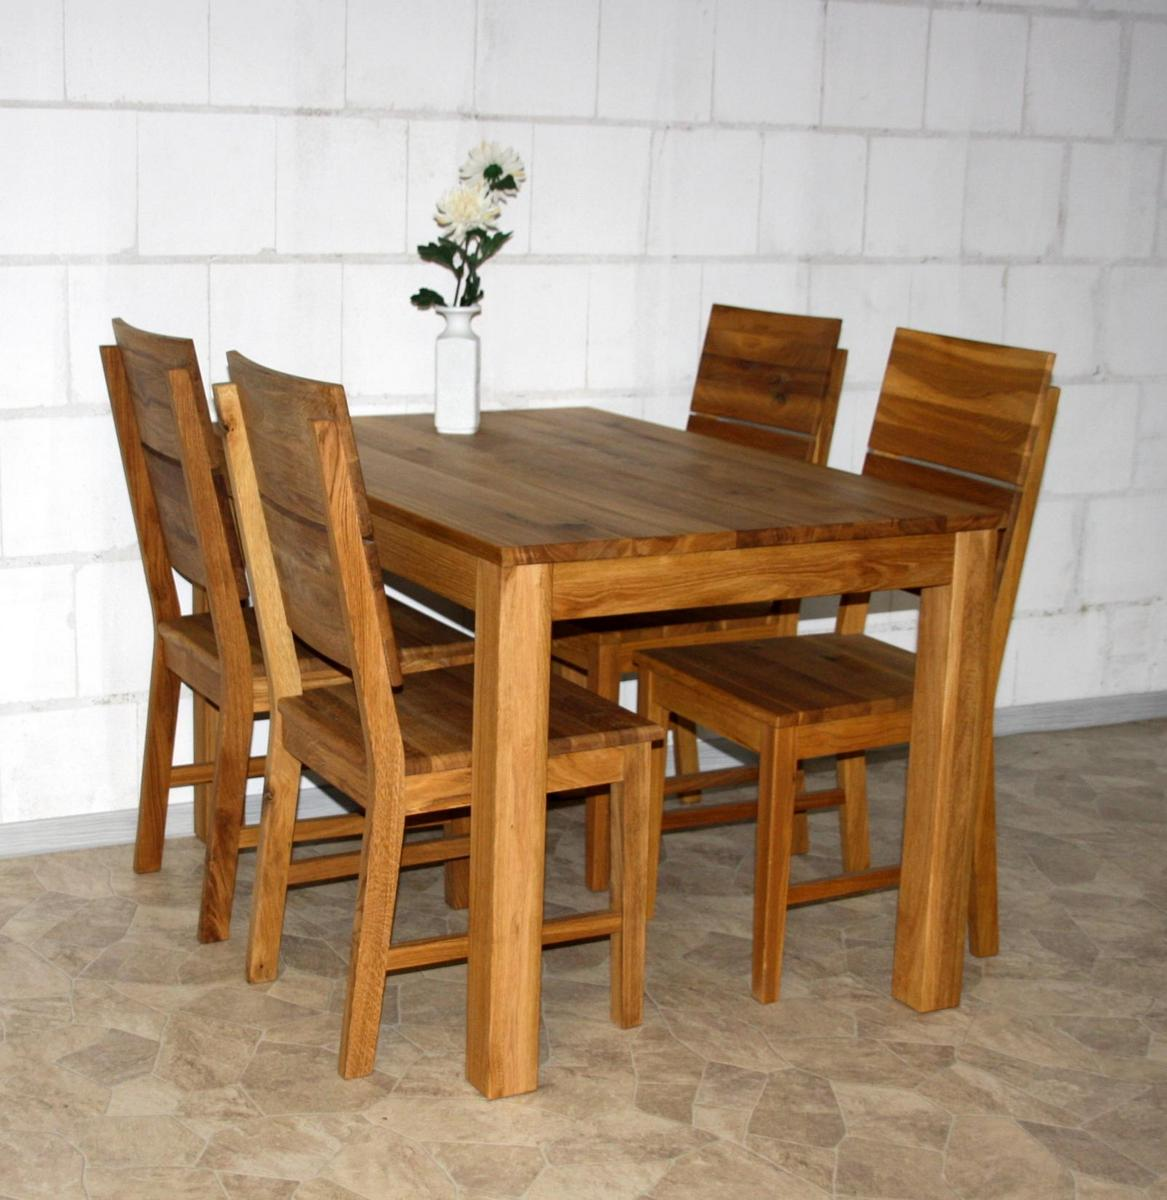 massivholz essgruppe tischgruppe komplett wildeiche massiv. Black Bedroom Furniture Sets. Home Design Ideas